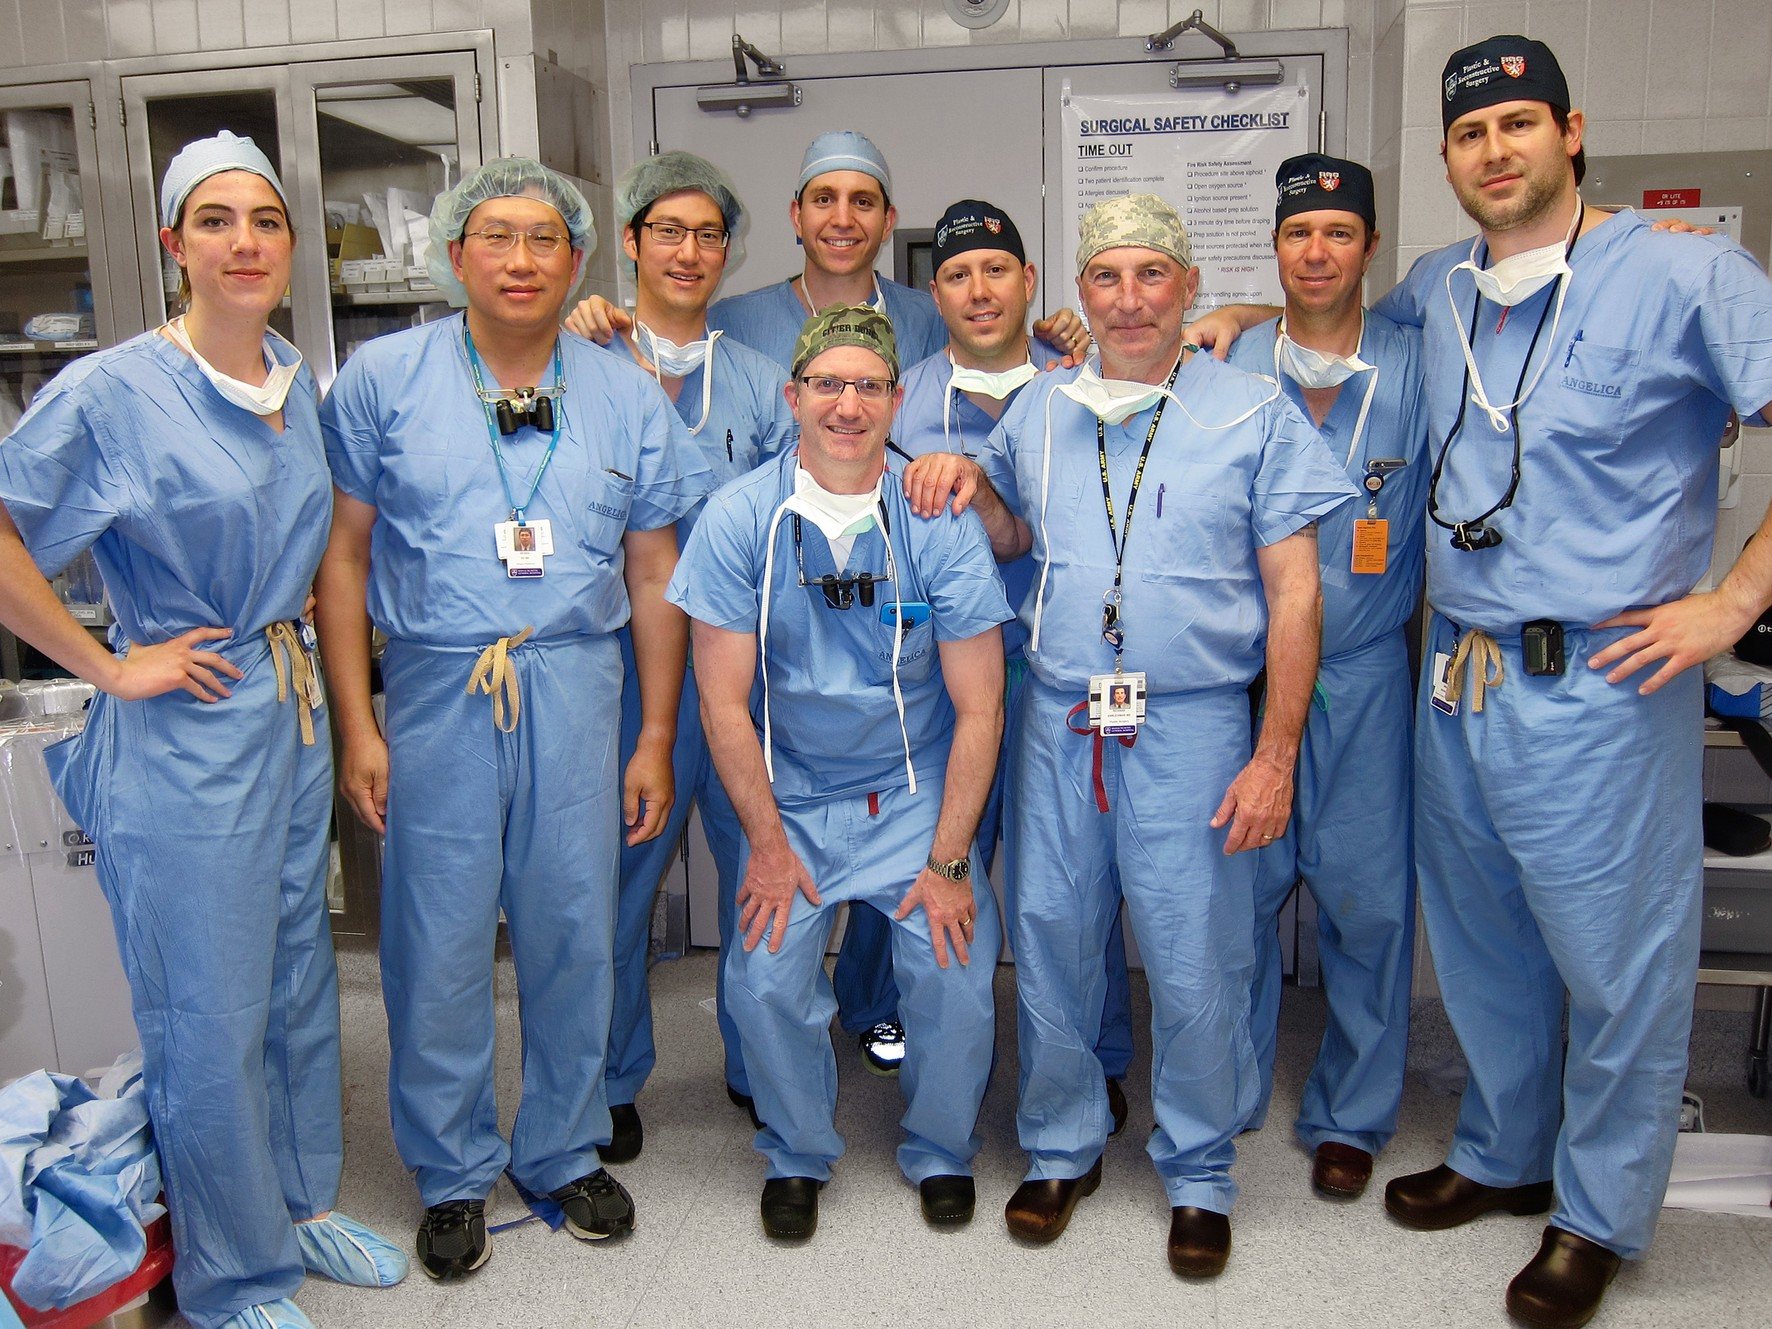 Команда хирургов, которые провели операцию